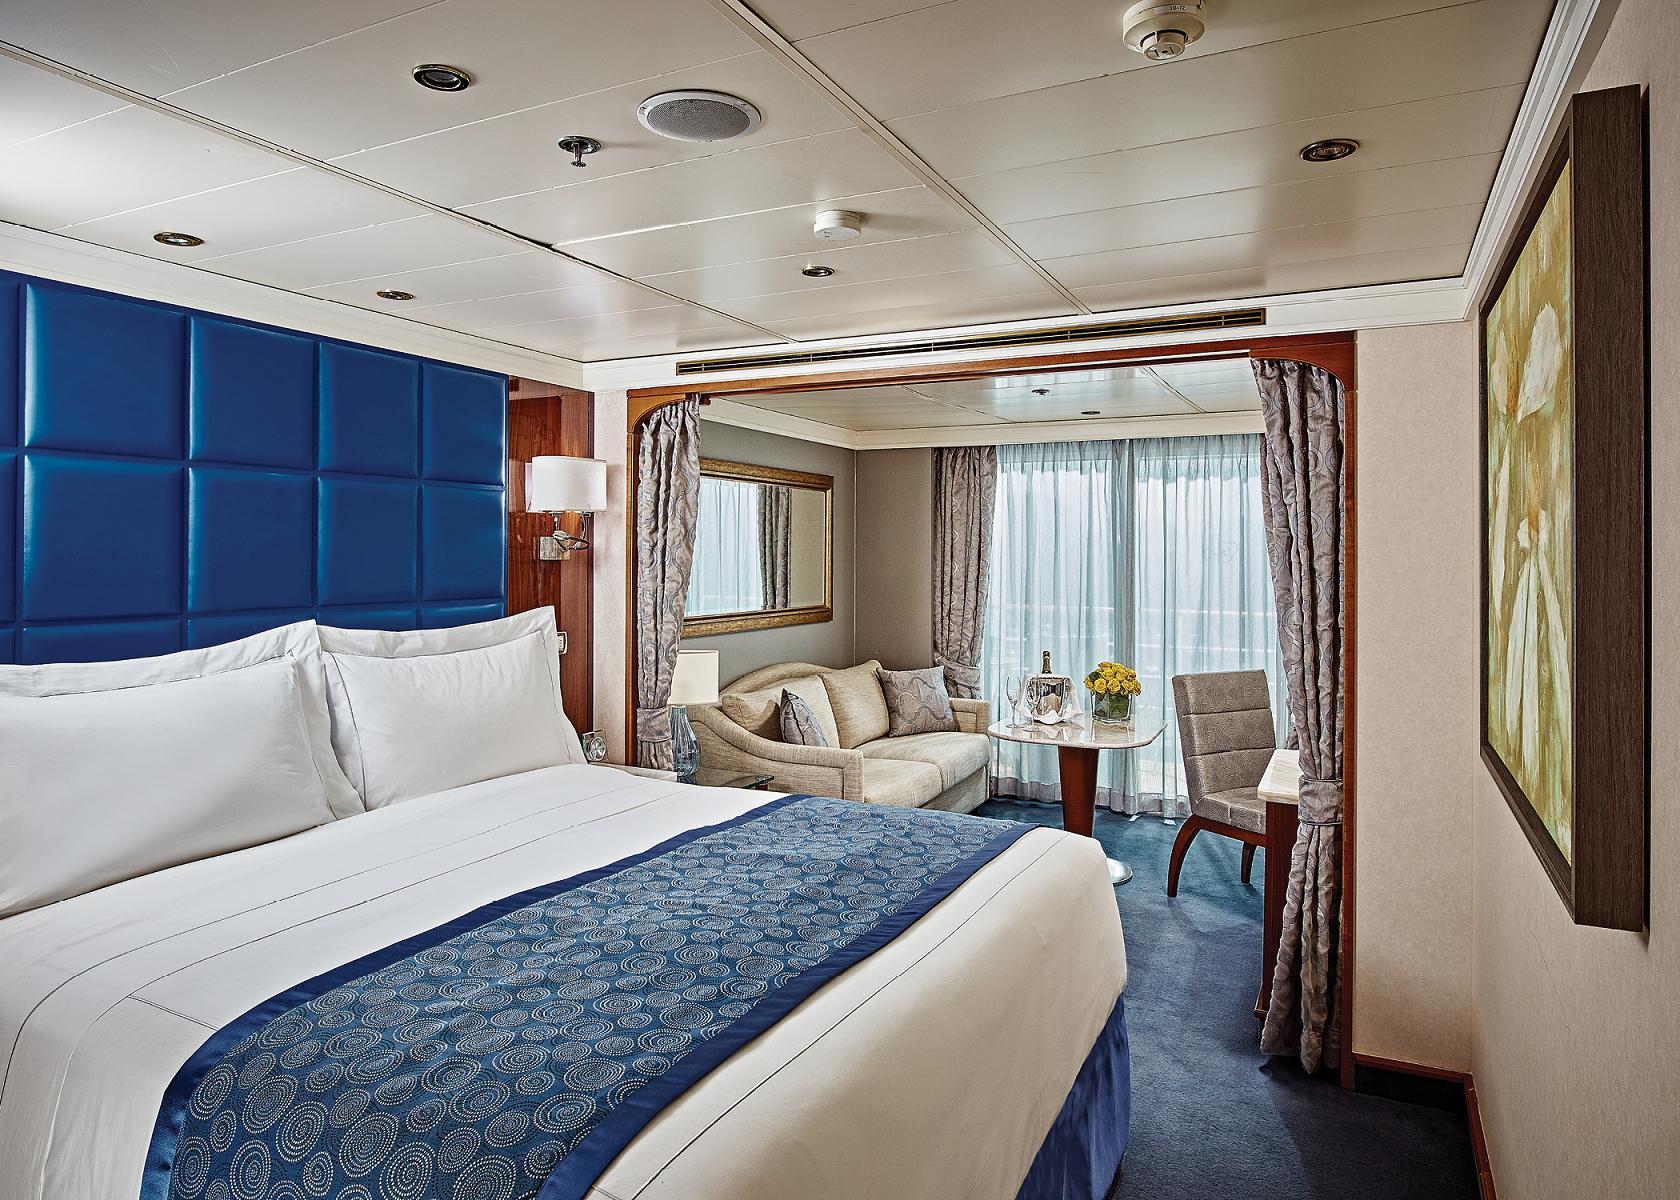 REGENT SEVEN SEAS CRUISES SEVEN SEAS NAVIGATOR REGENT CRUISES LUXURY CRUISES REGEN SEVEN SEAS CRUCEROS DE LUJO REGENT SEVEN SEAS NAVIGATOR CRUCEROS RSSC REGENT CRUISES CRUCEROS EN SUITE  #crucerosdelujo #luxurycruises #crucerosexclusivos #regentsevenseas #regentcruises #rssc #crucerosregent #sevenseasnavigator #crucerosensuite #crucerospararicos #richpeoplecruises #millionairescruises